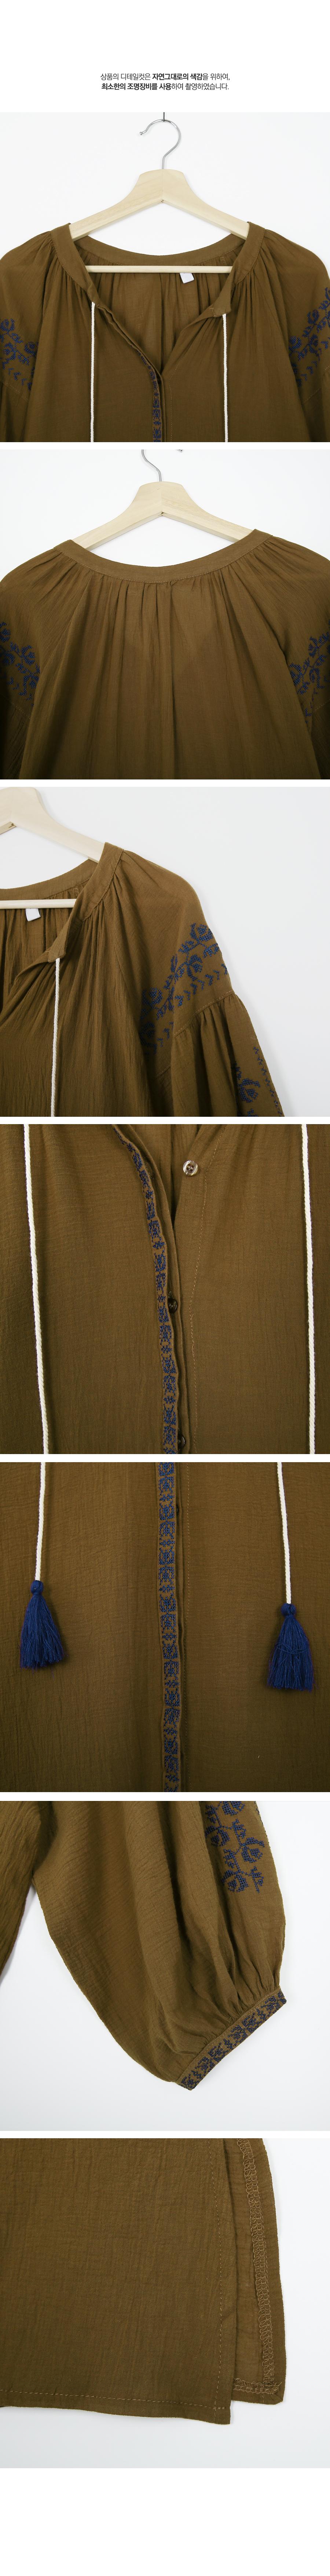 Aladdin Ethnic Tassel Dress